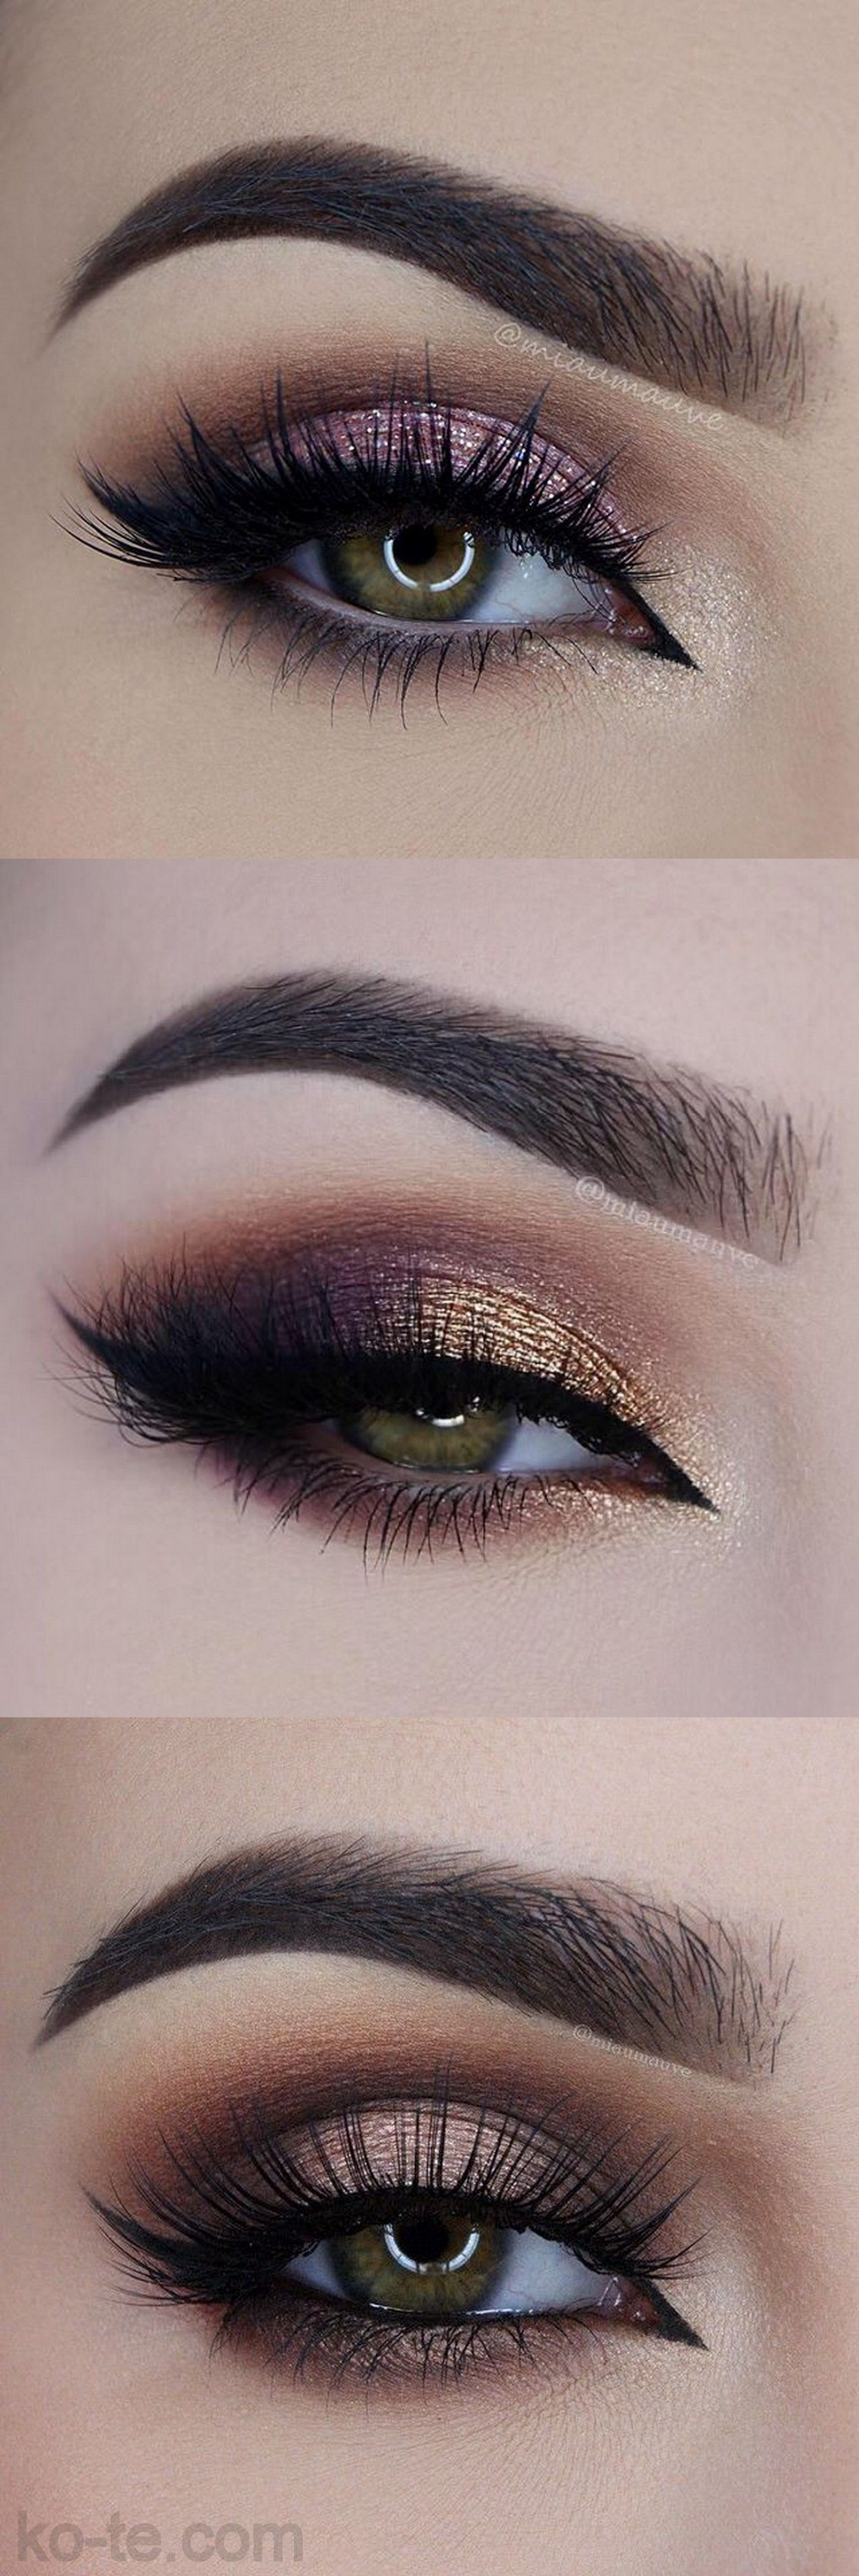 Eye makeup  | ko-te.com by @evatornado |